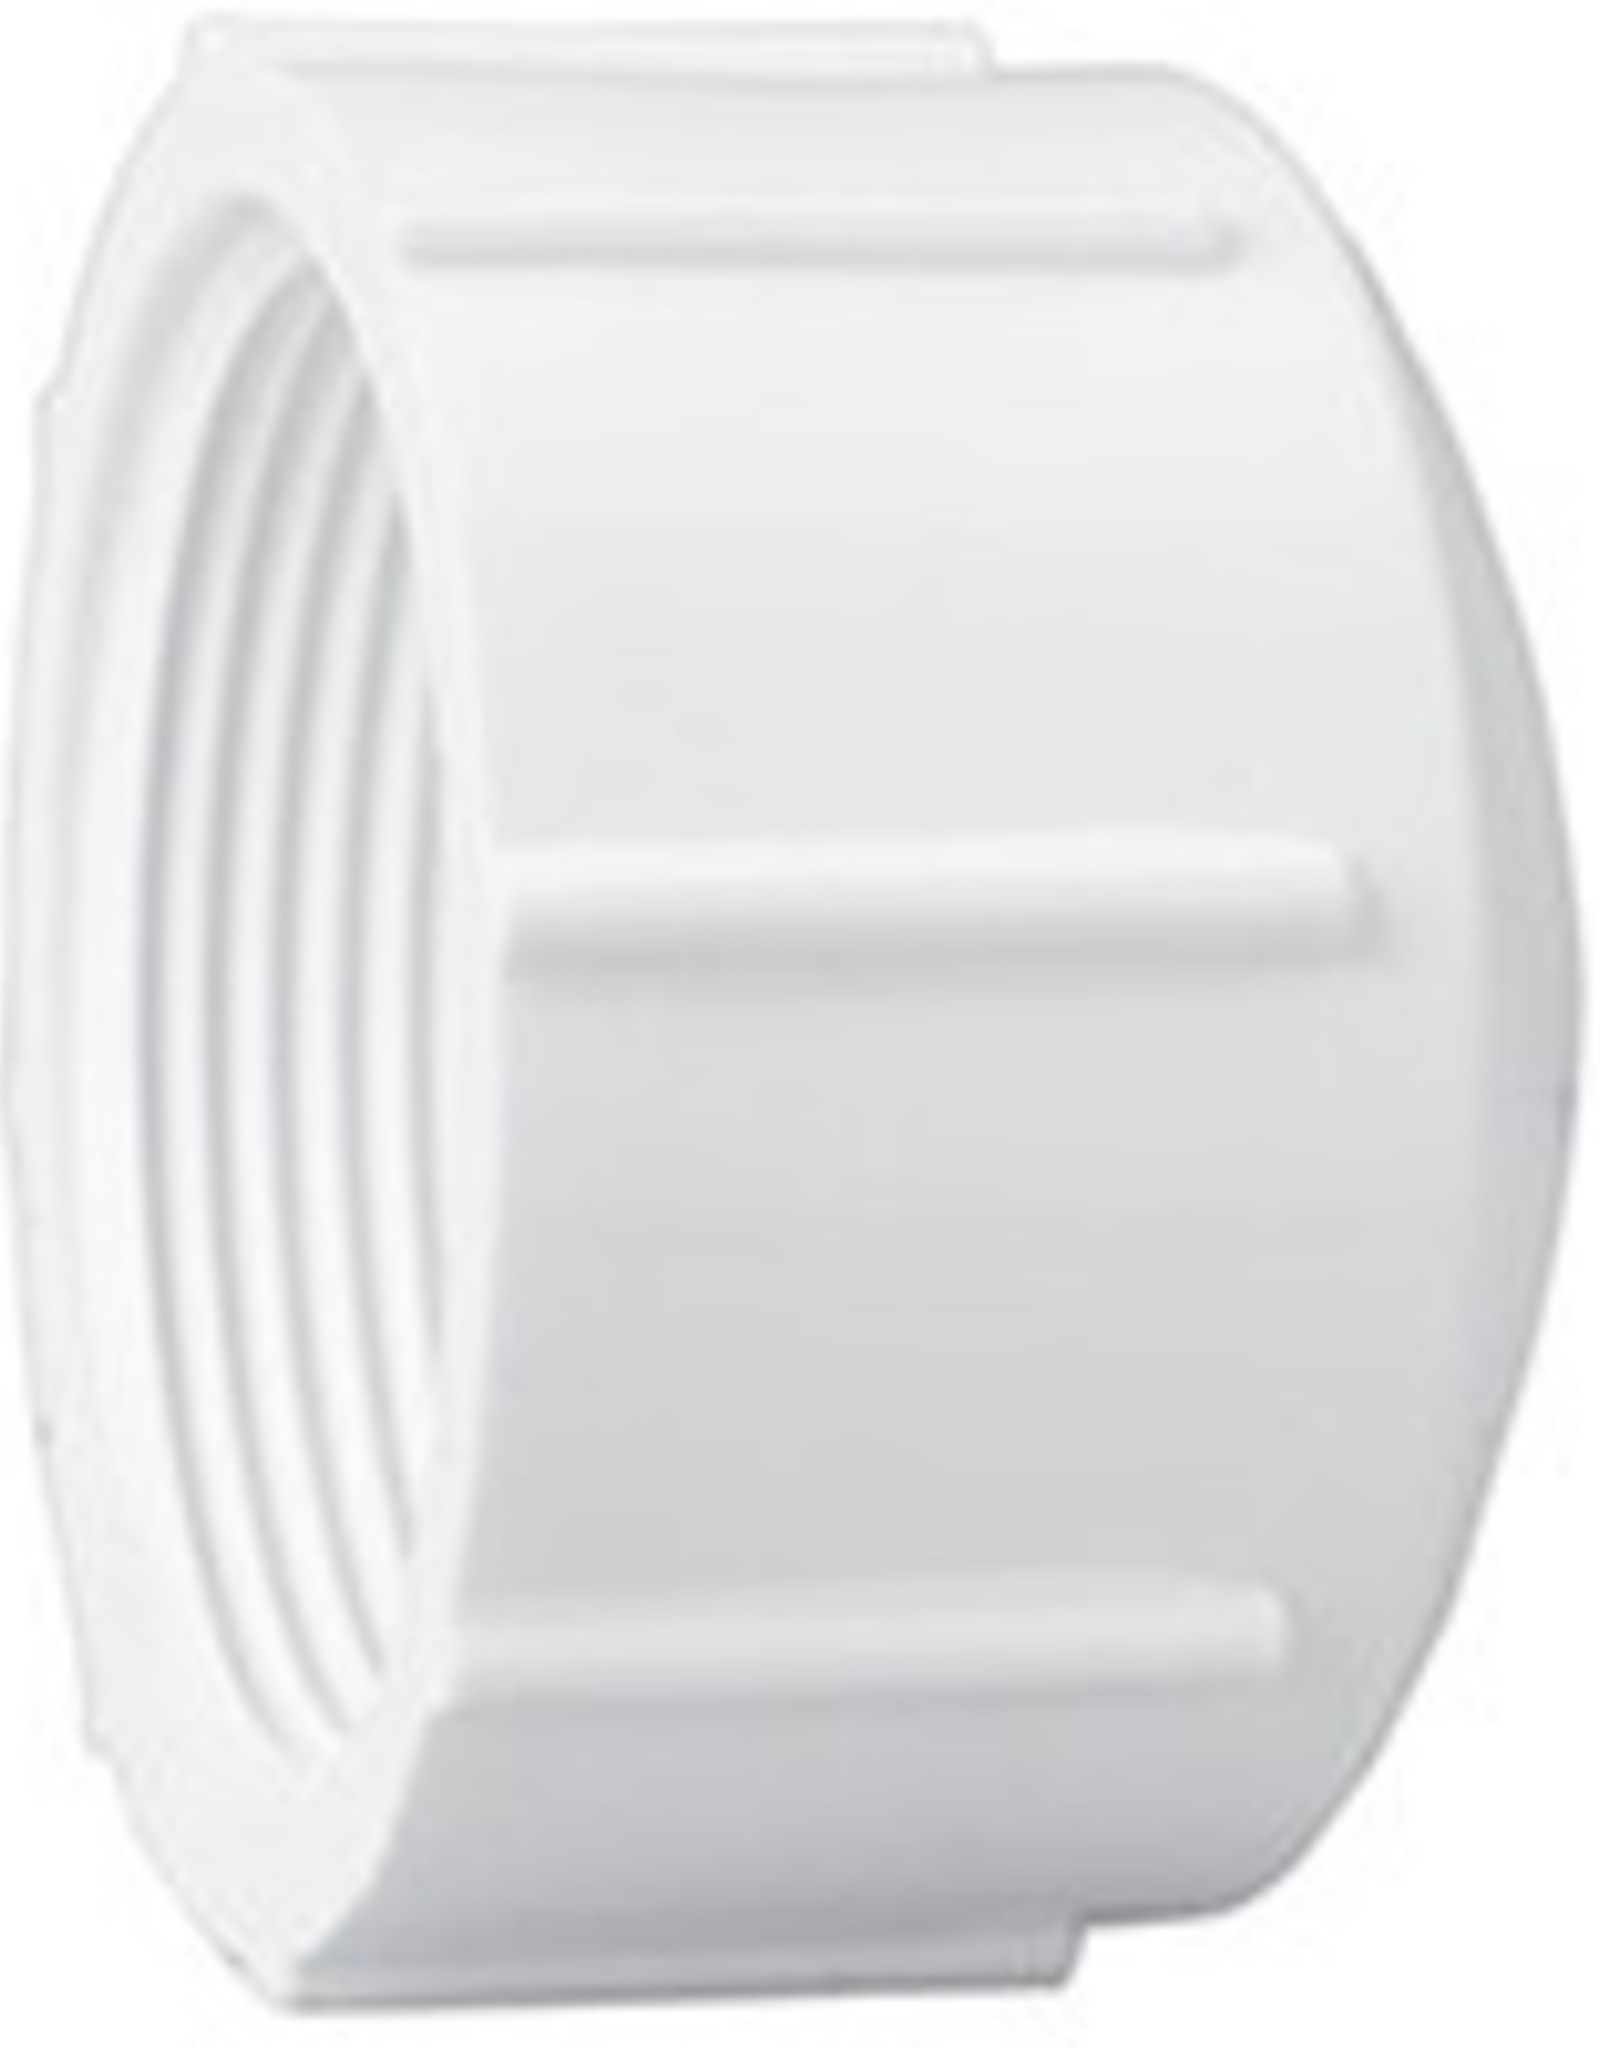 "Lasco Fittings PVC 3/4"" Threaded Cap Fitting SCH 40"